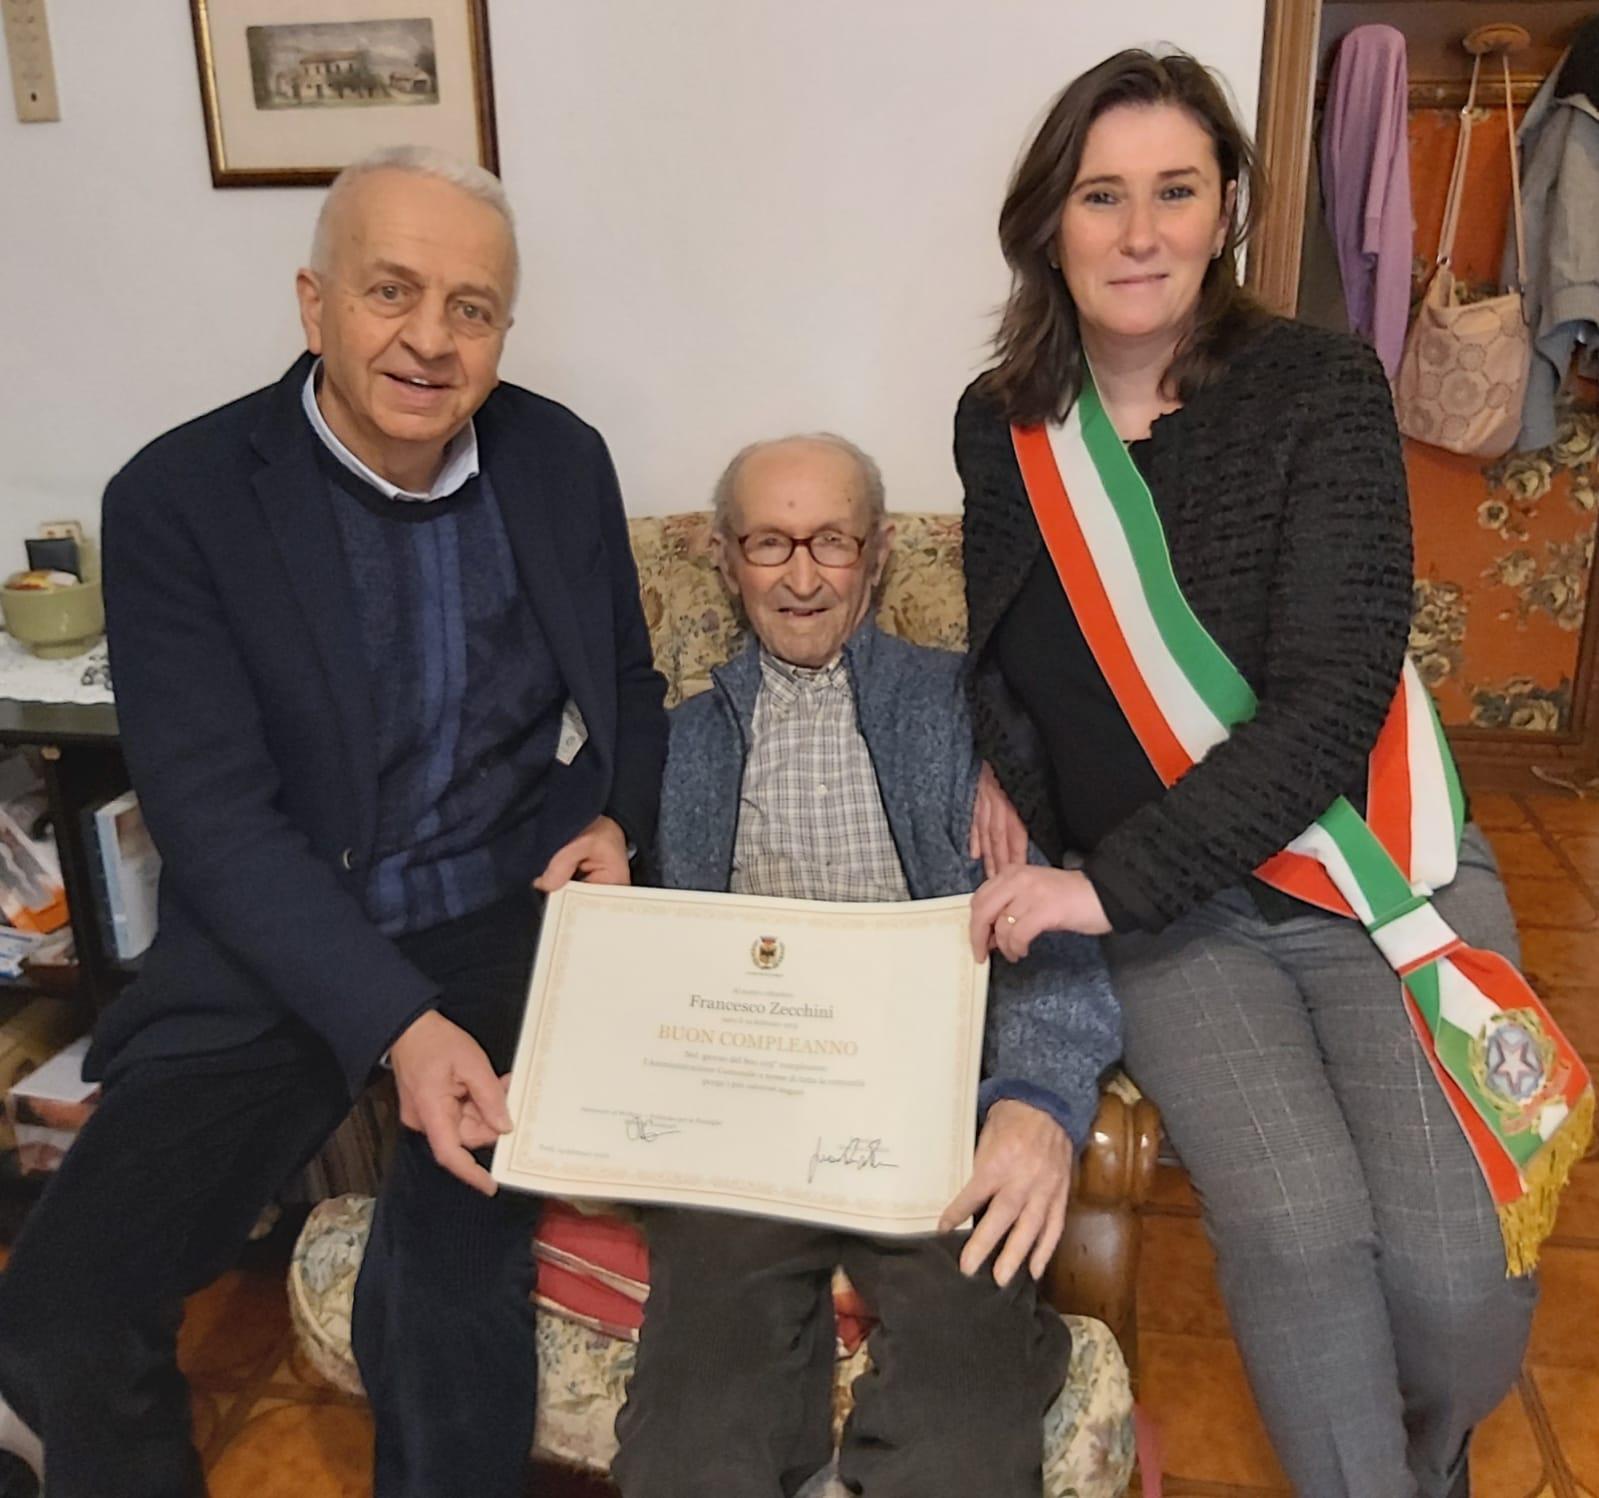 Francesco-Zecchini-di-105-anni